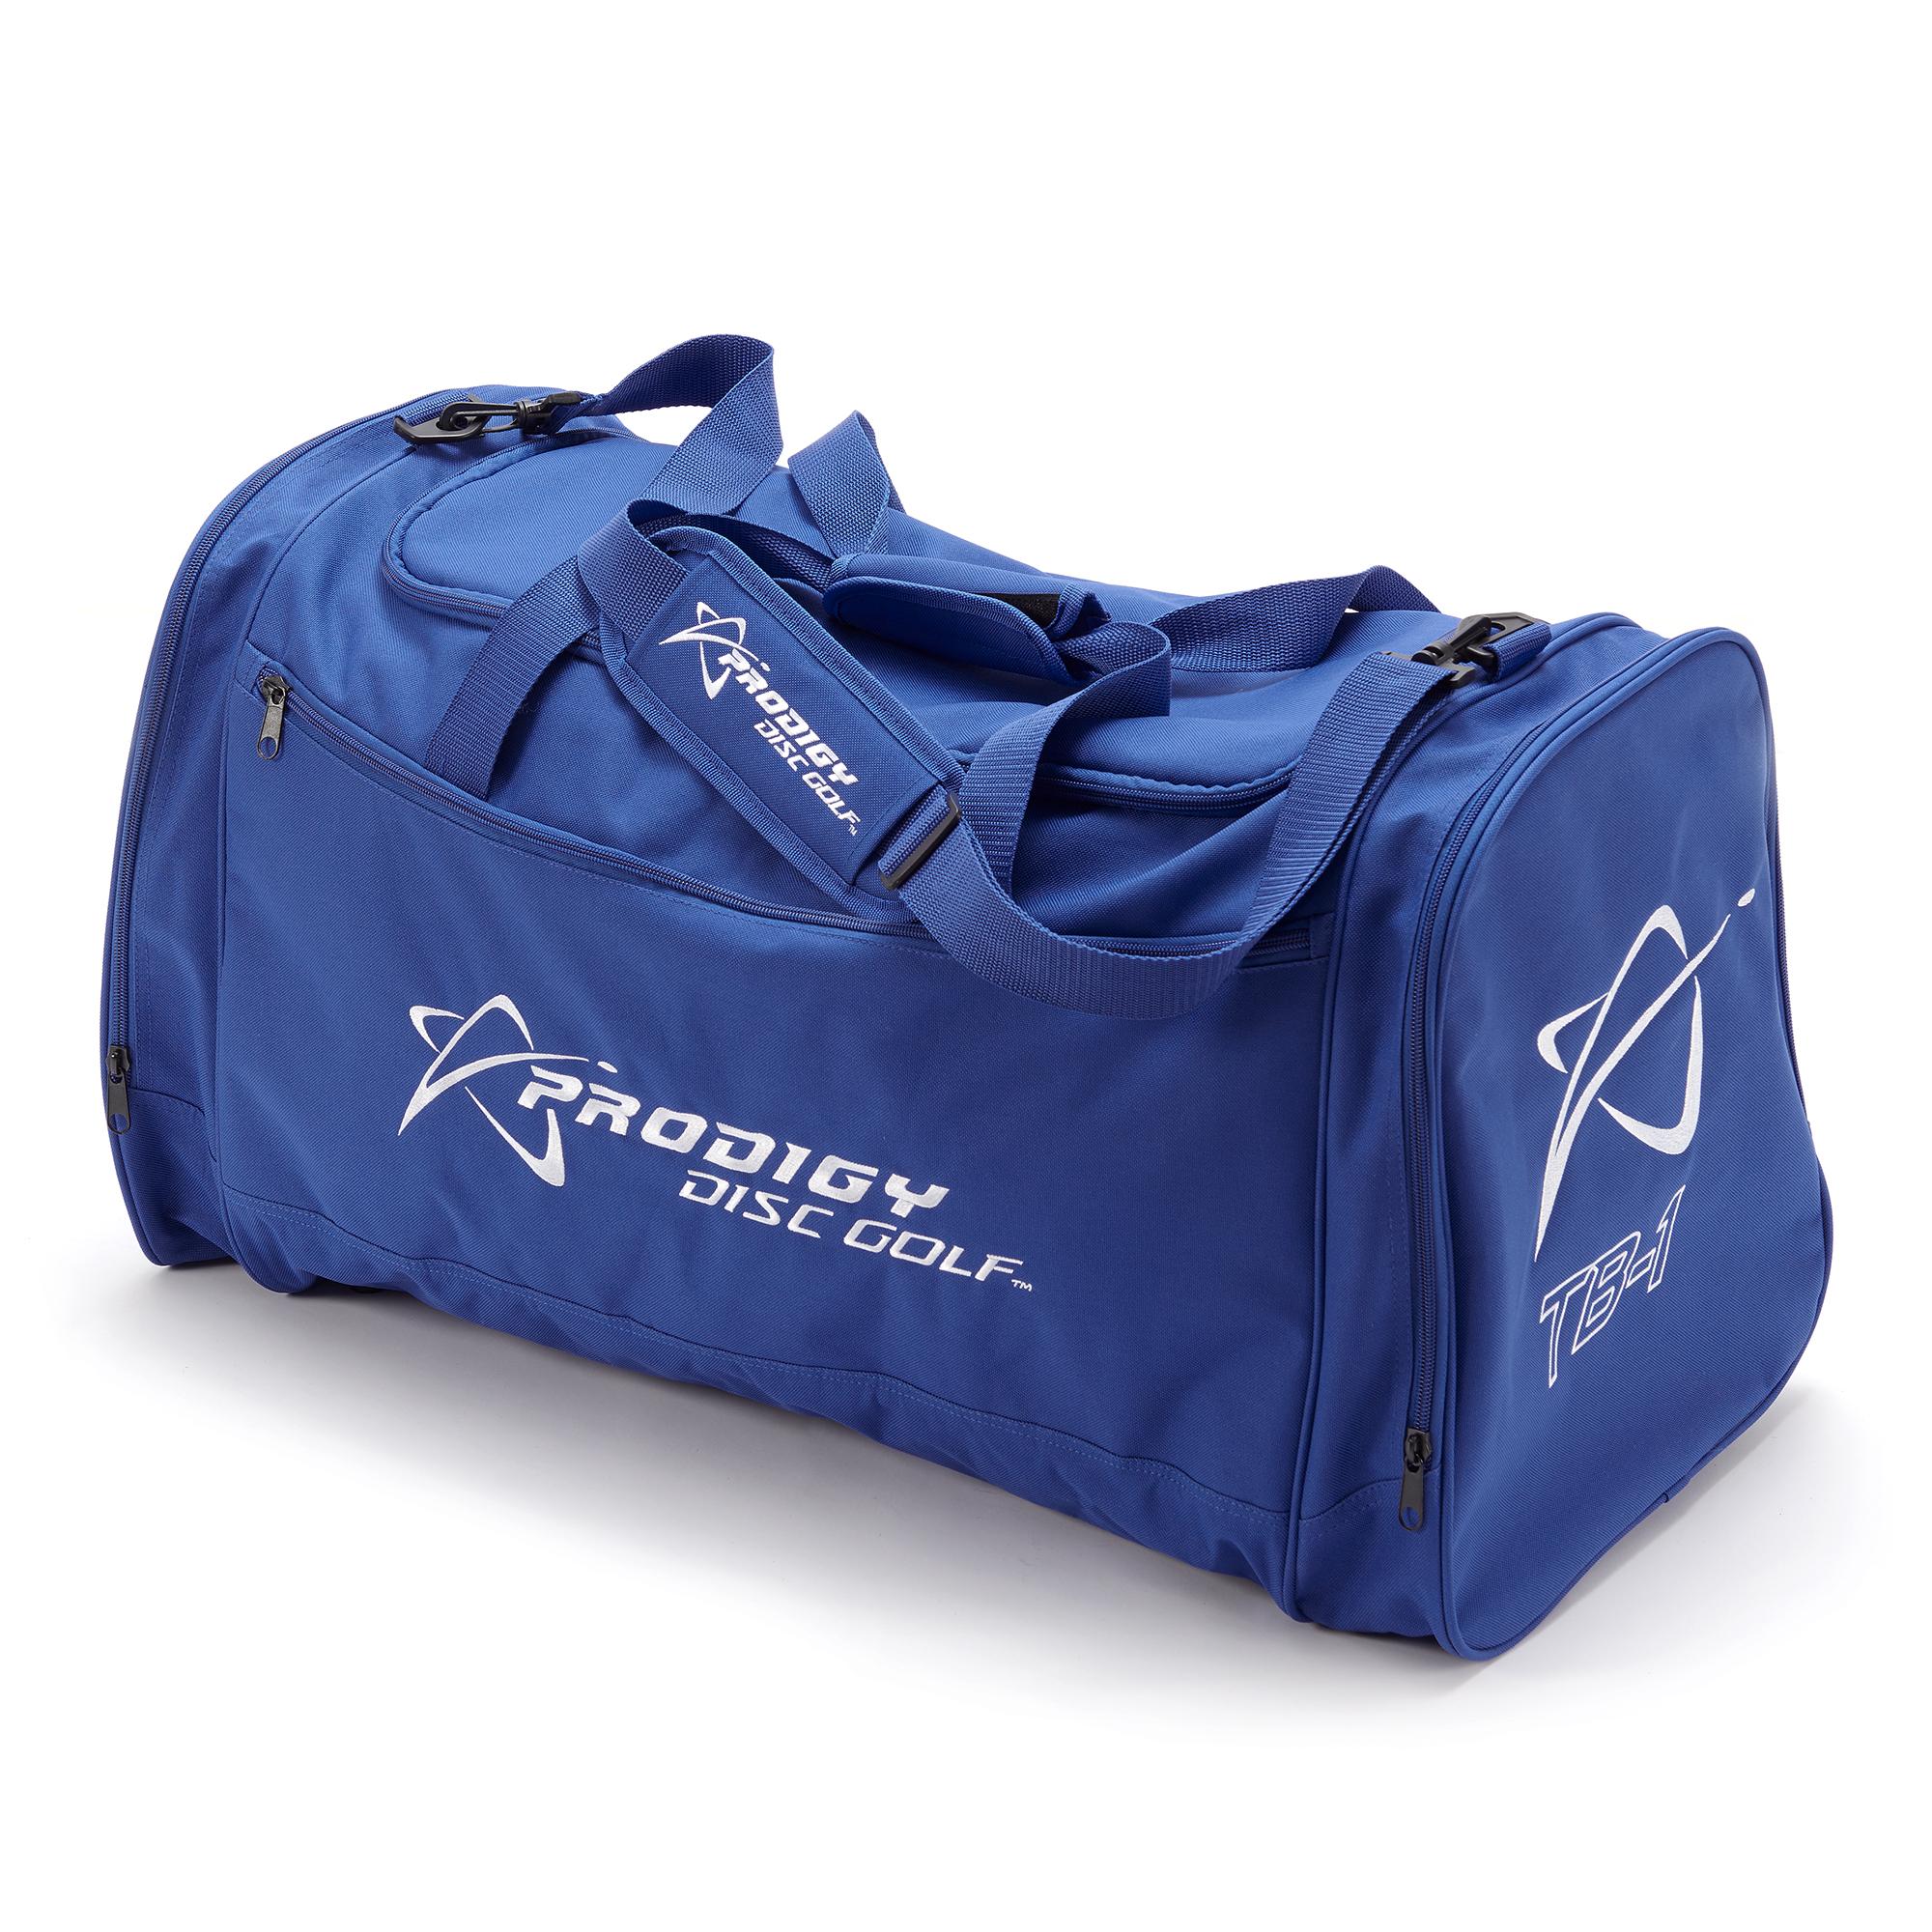 prodigy-travel-bag-blue-thumbnail.jpg